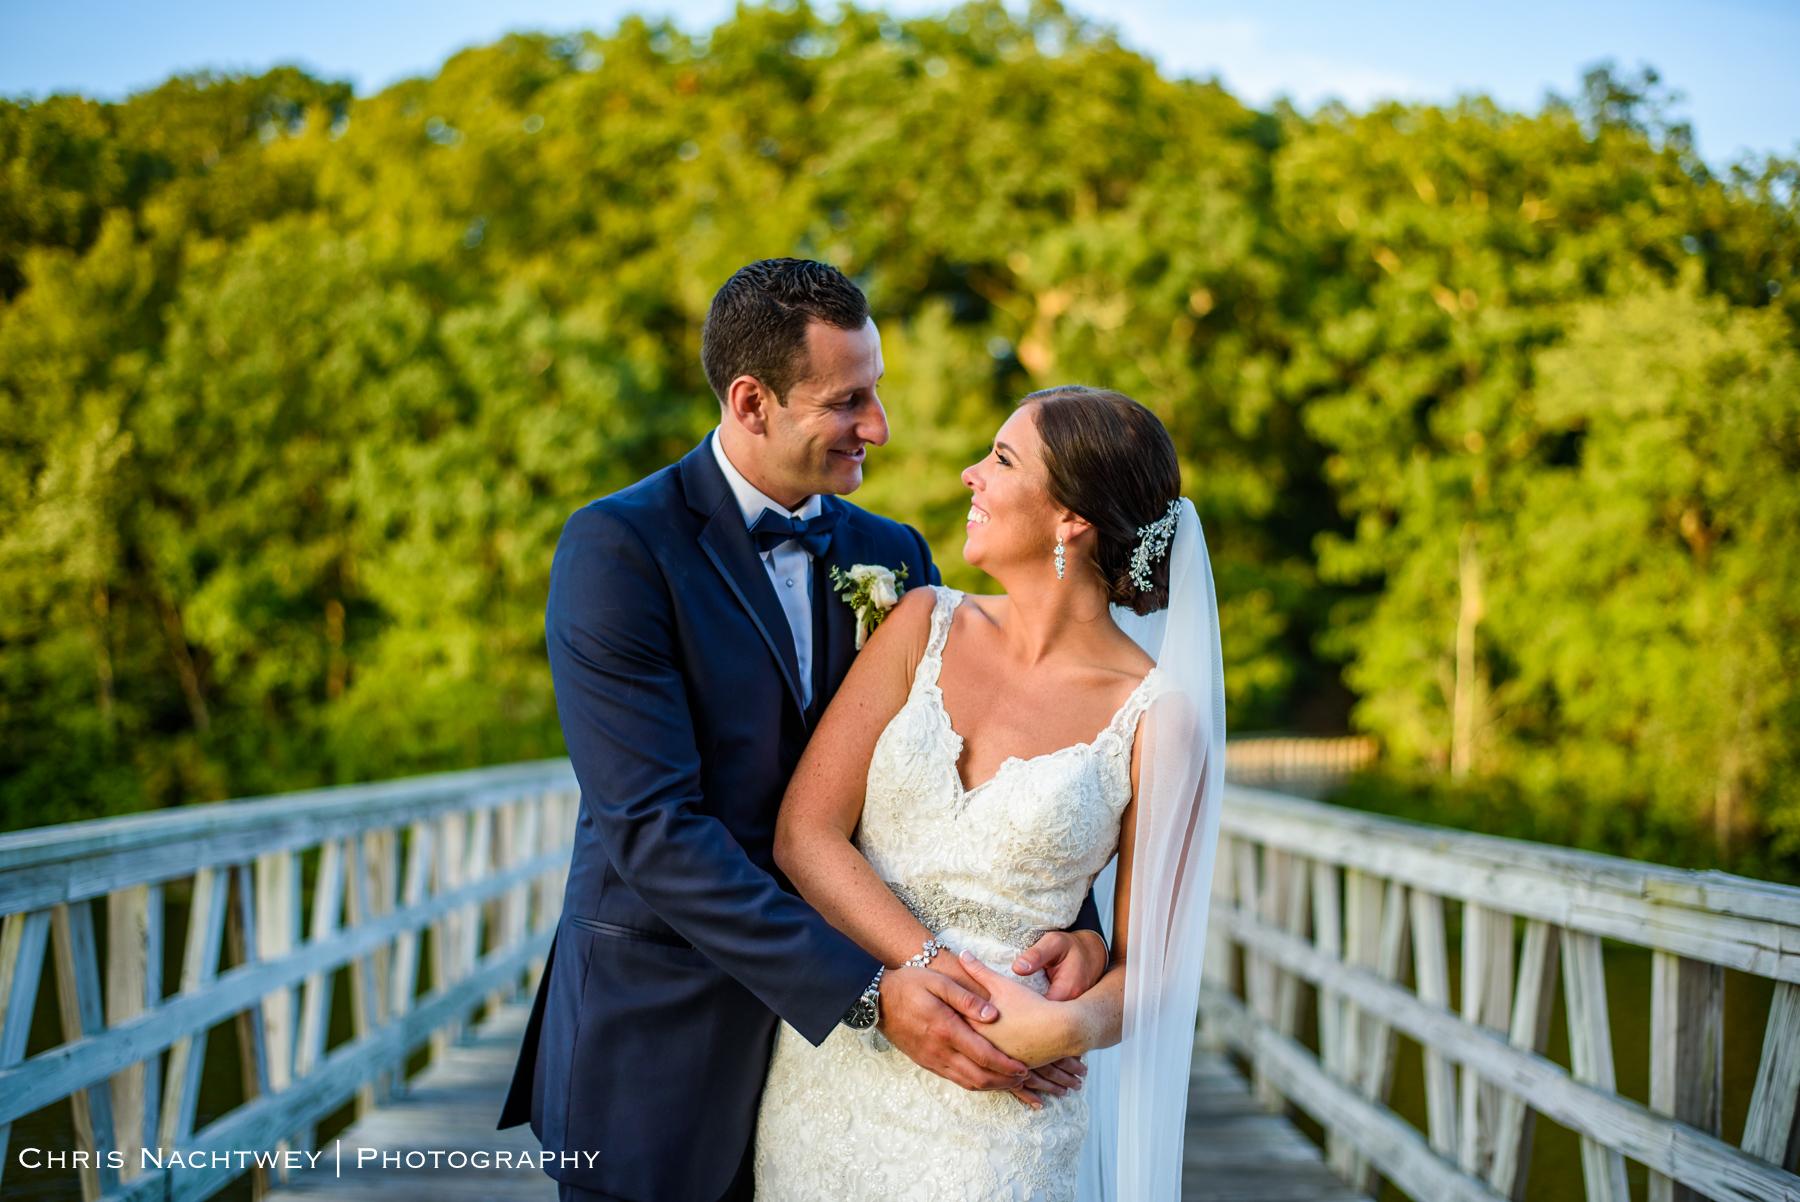 wedding-lake-of-isles-photos-chris-nachtwey-photography-2019-40.jpg